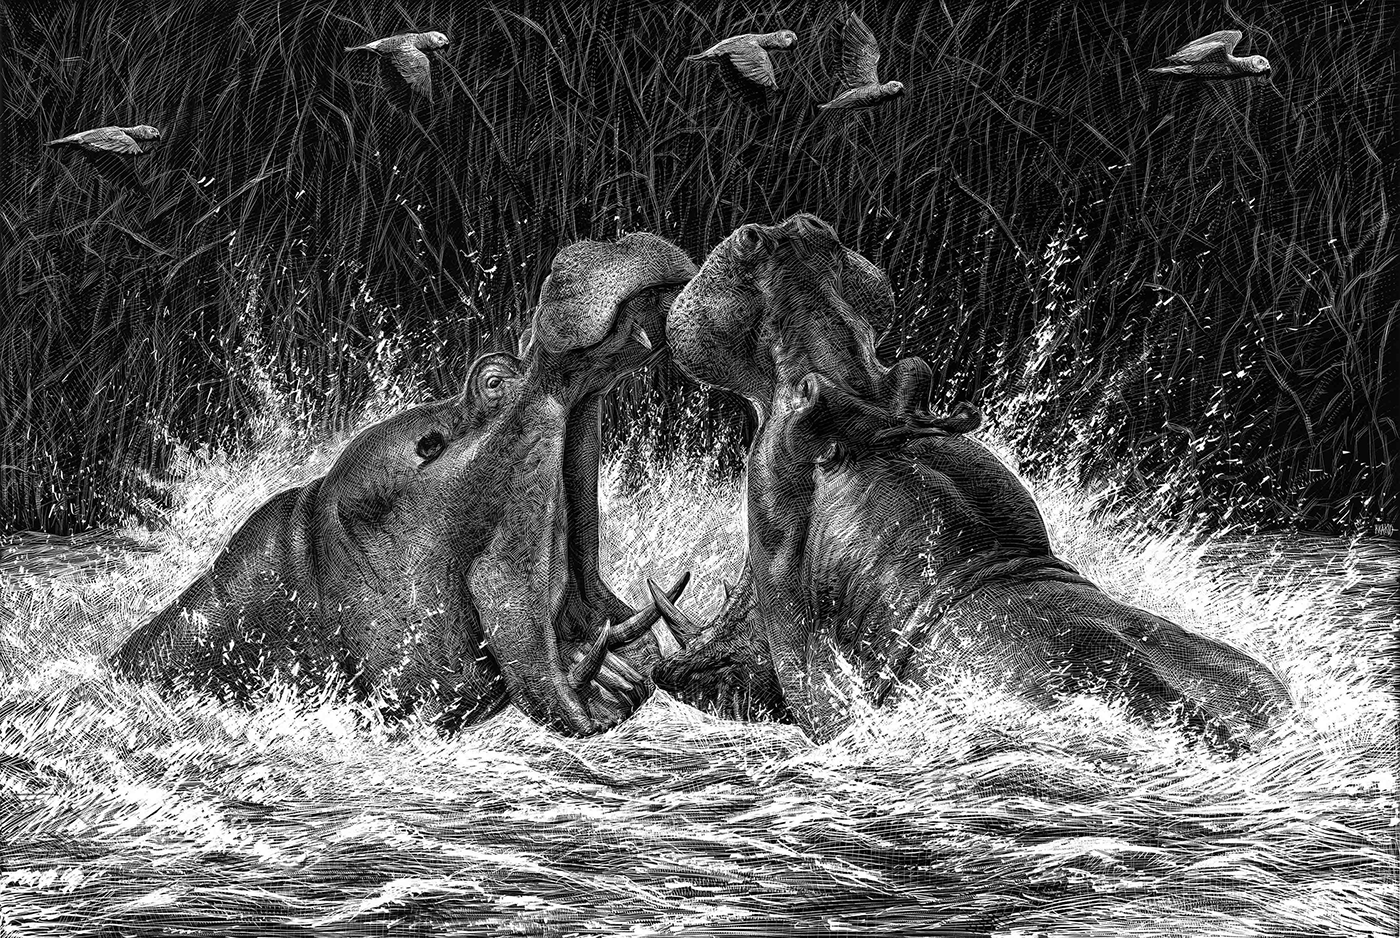 El Animal Ilustrado / работы Ricardo Martinez